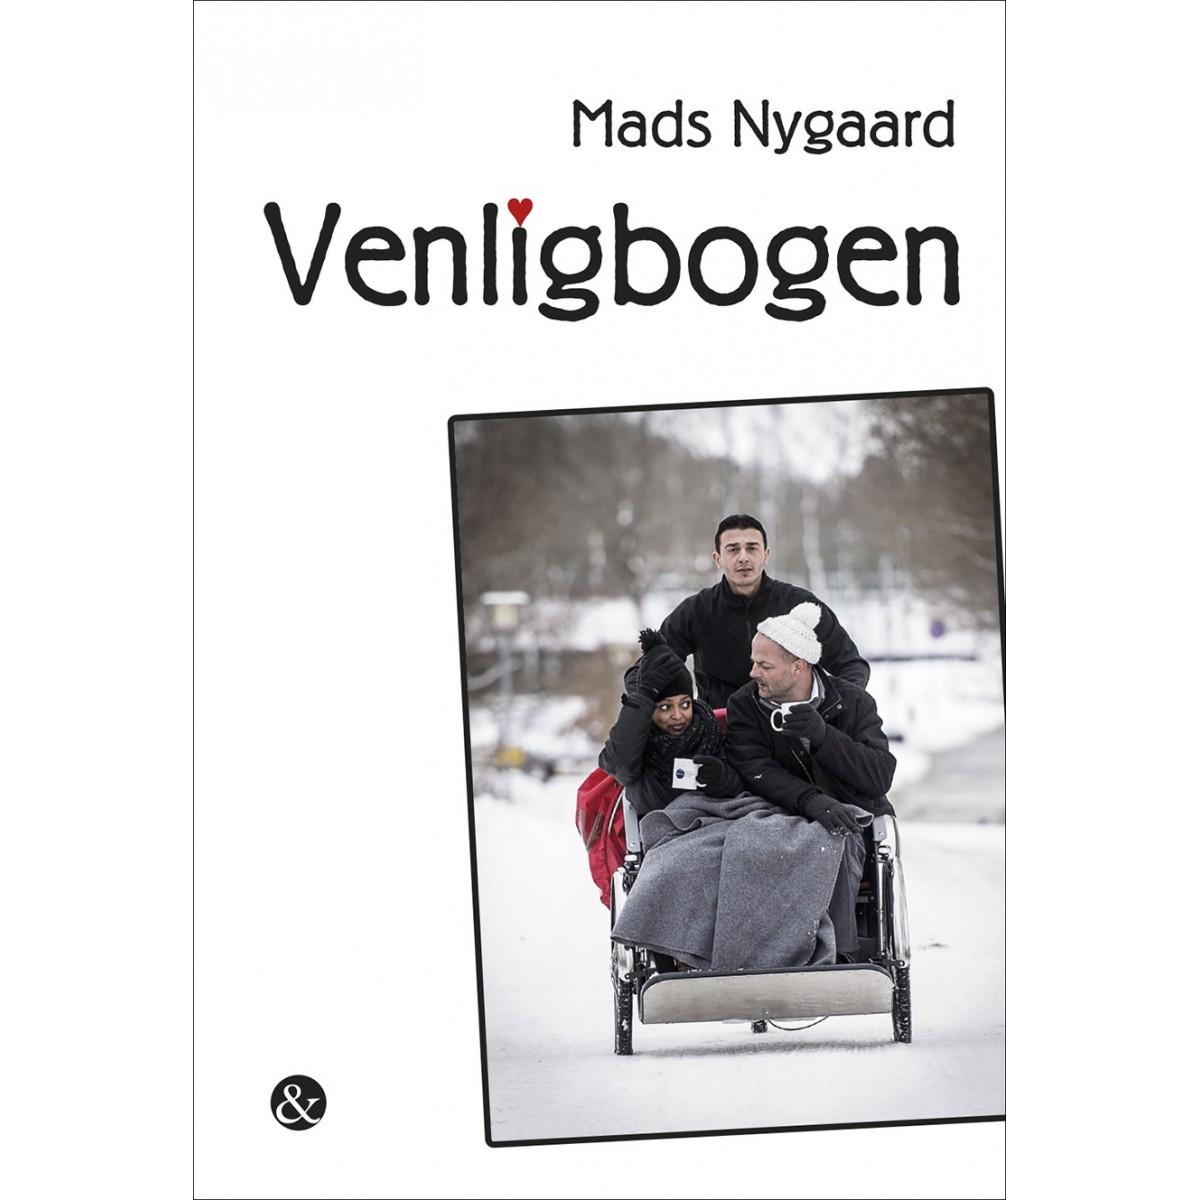 Mads Nygaard: Venligbogn